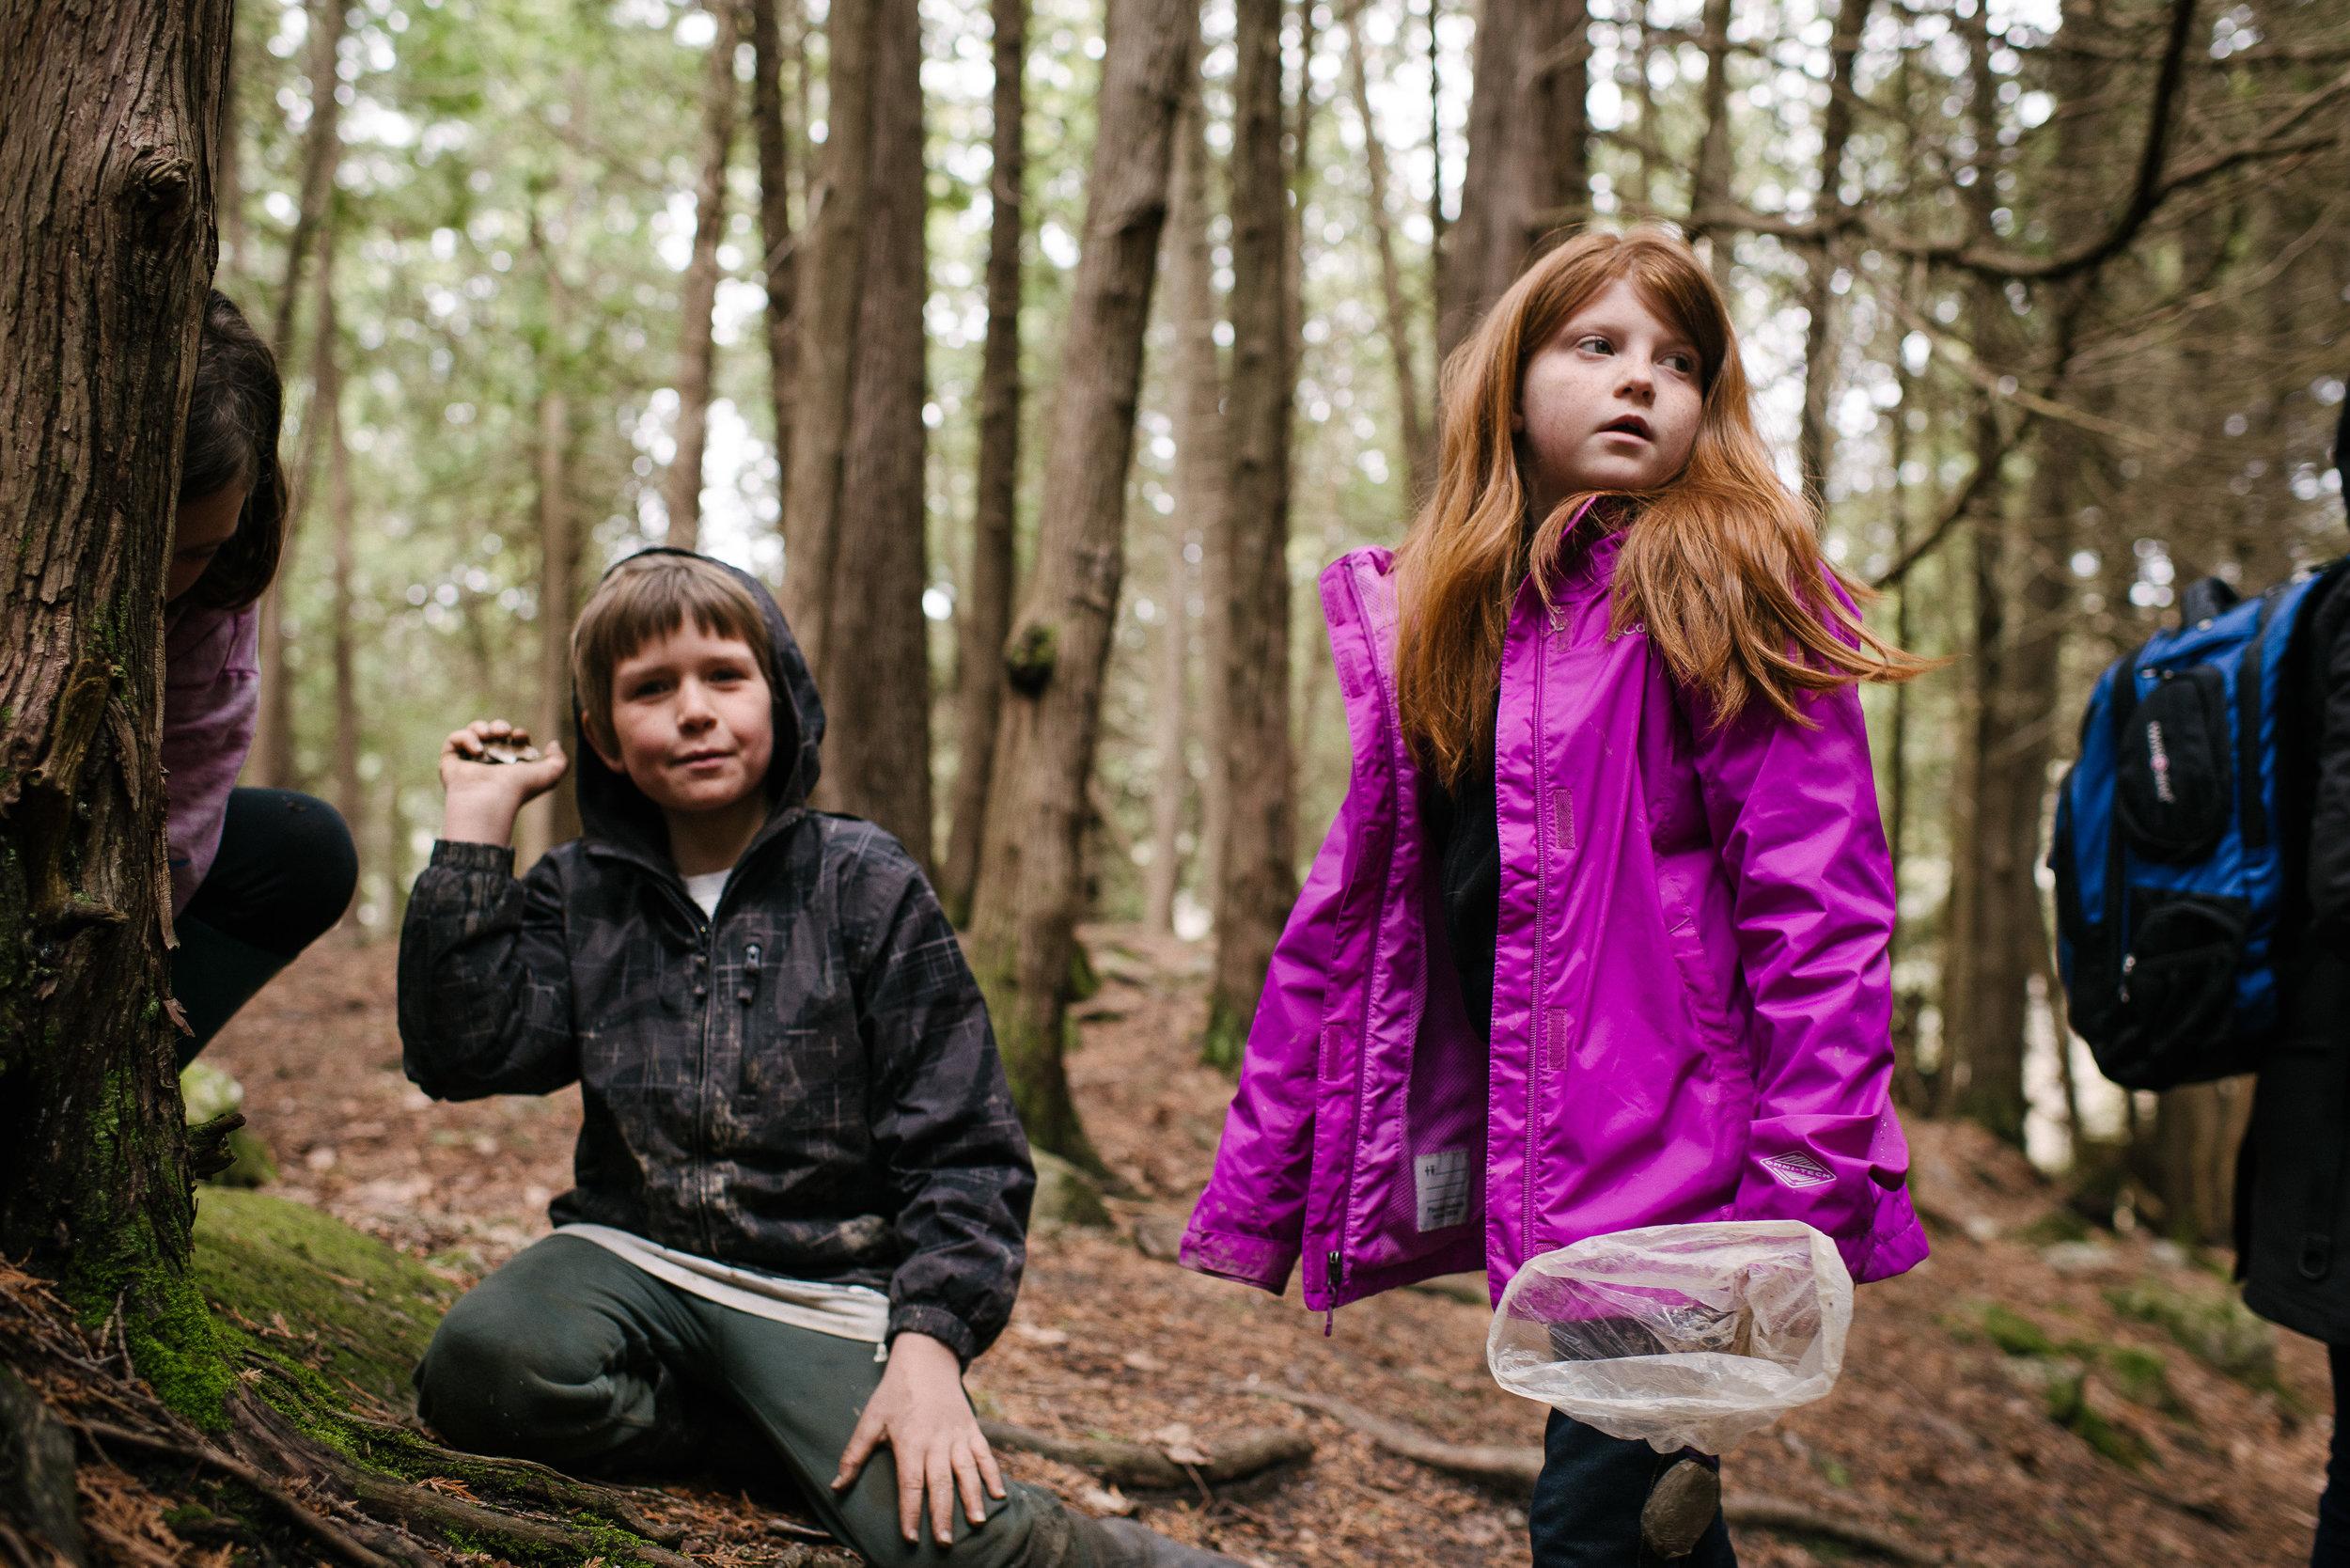 documentary school photography viara mileva kingston toronto ottawa-134052vm.jpg